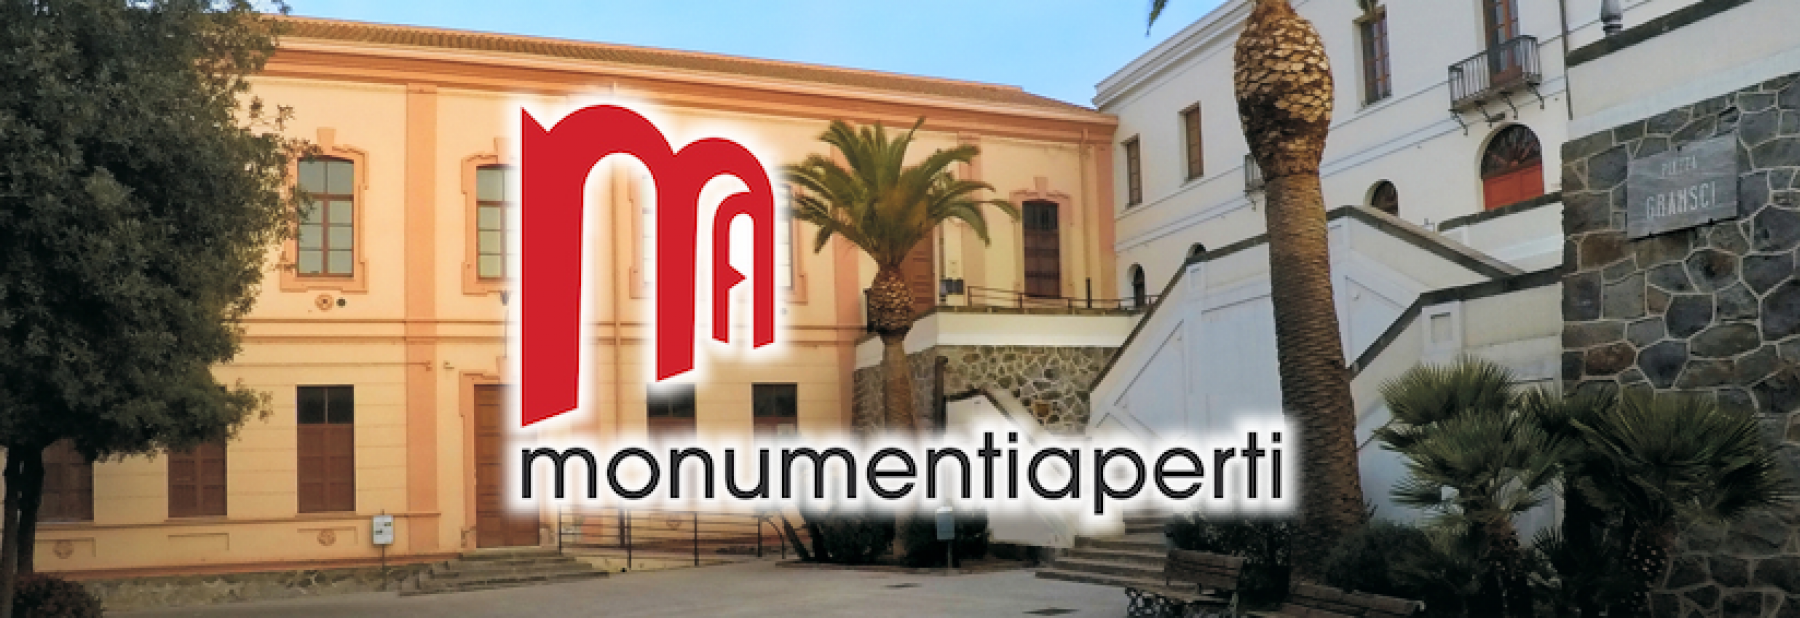 monumenti_aperti